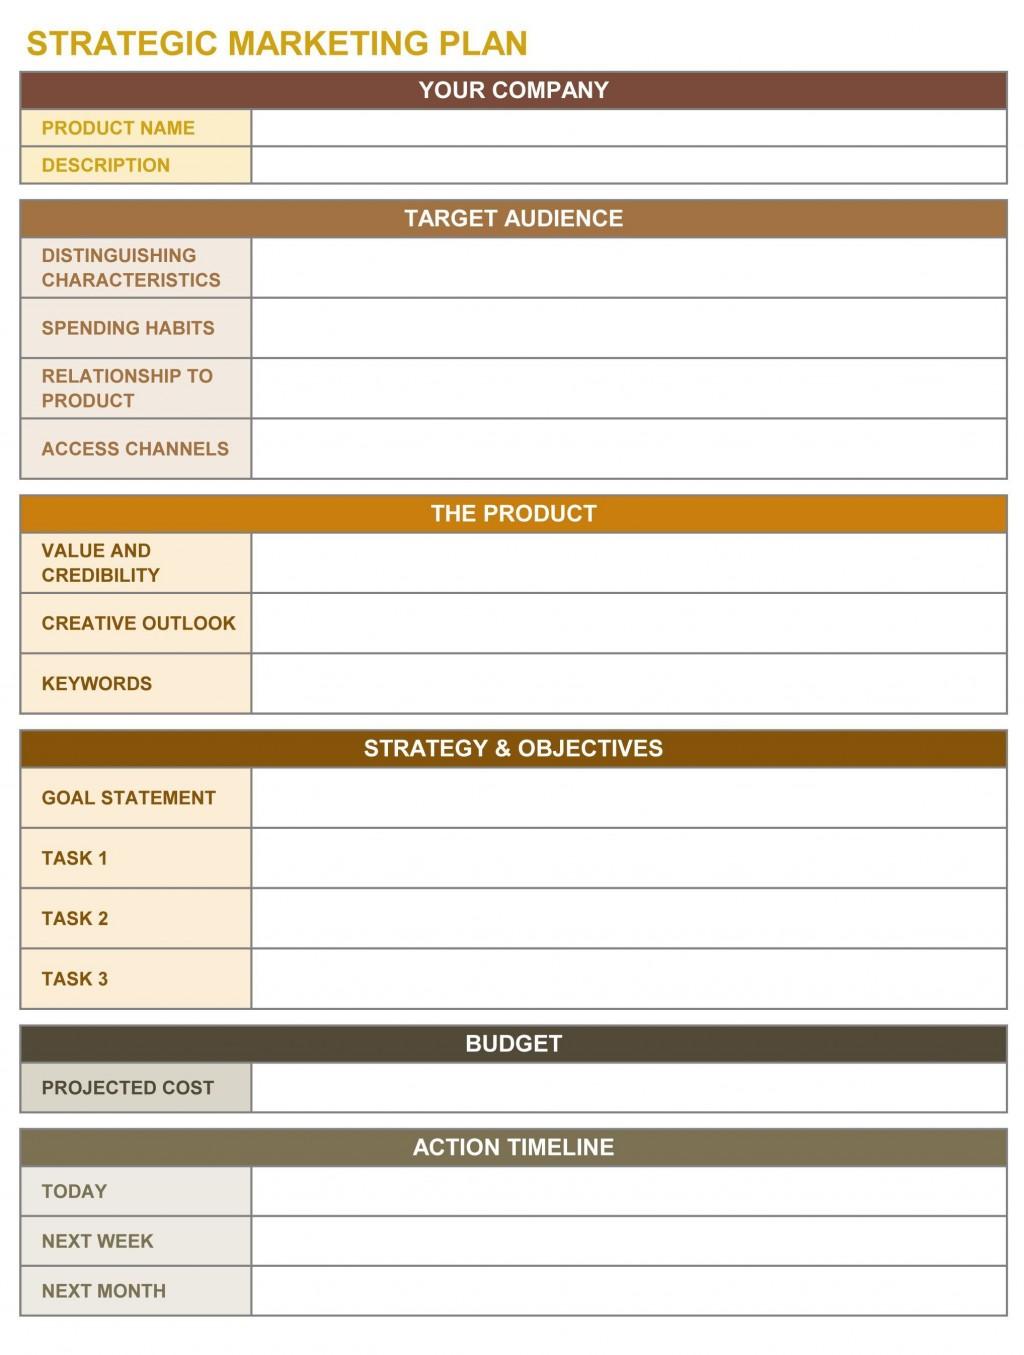 000 Wondrou Strategic Marketing Plan Template Image  Templates Example Pdf Word SampleLarge